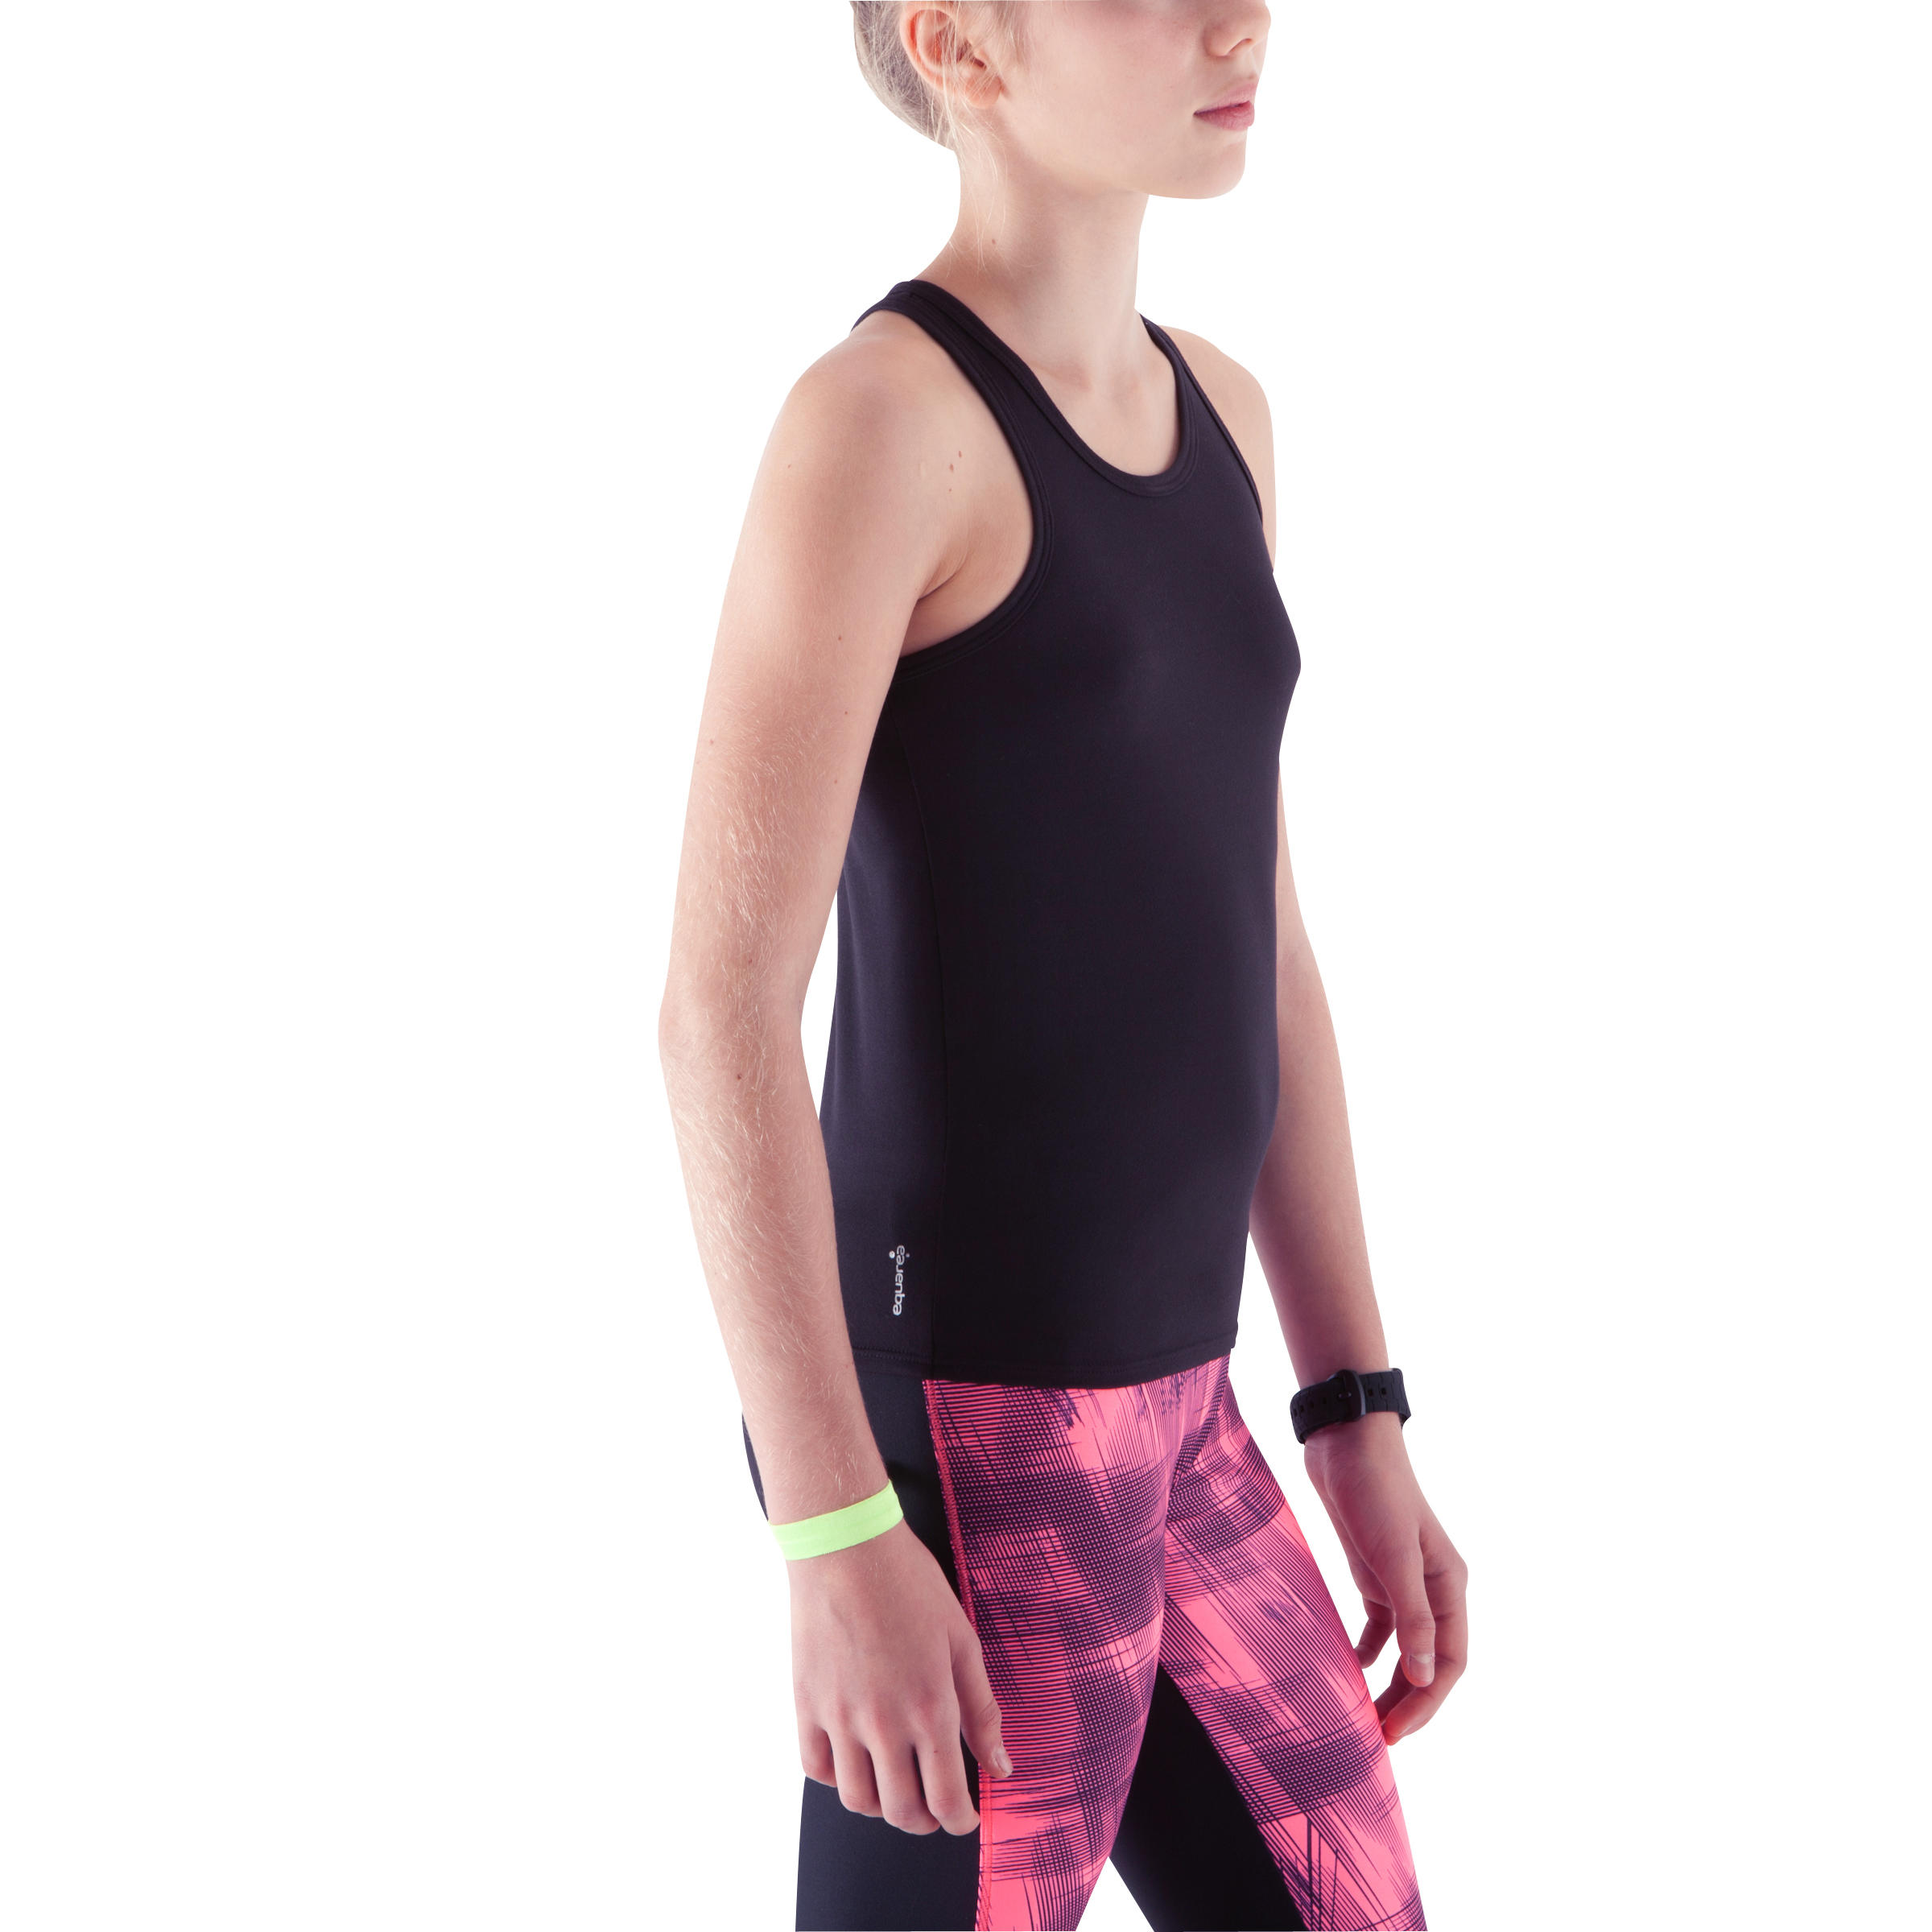 Energy Girls' Gym Tank Top - Black